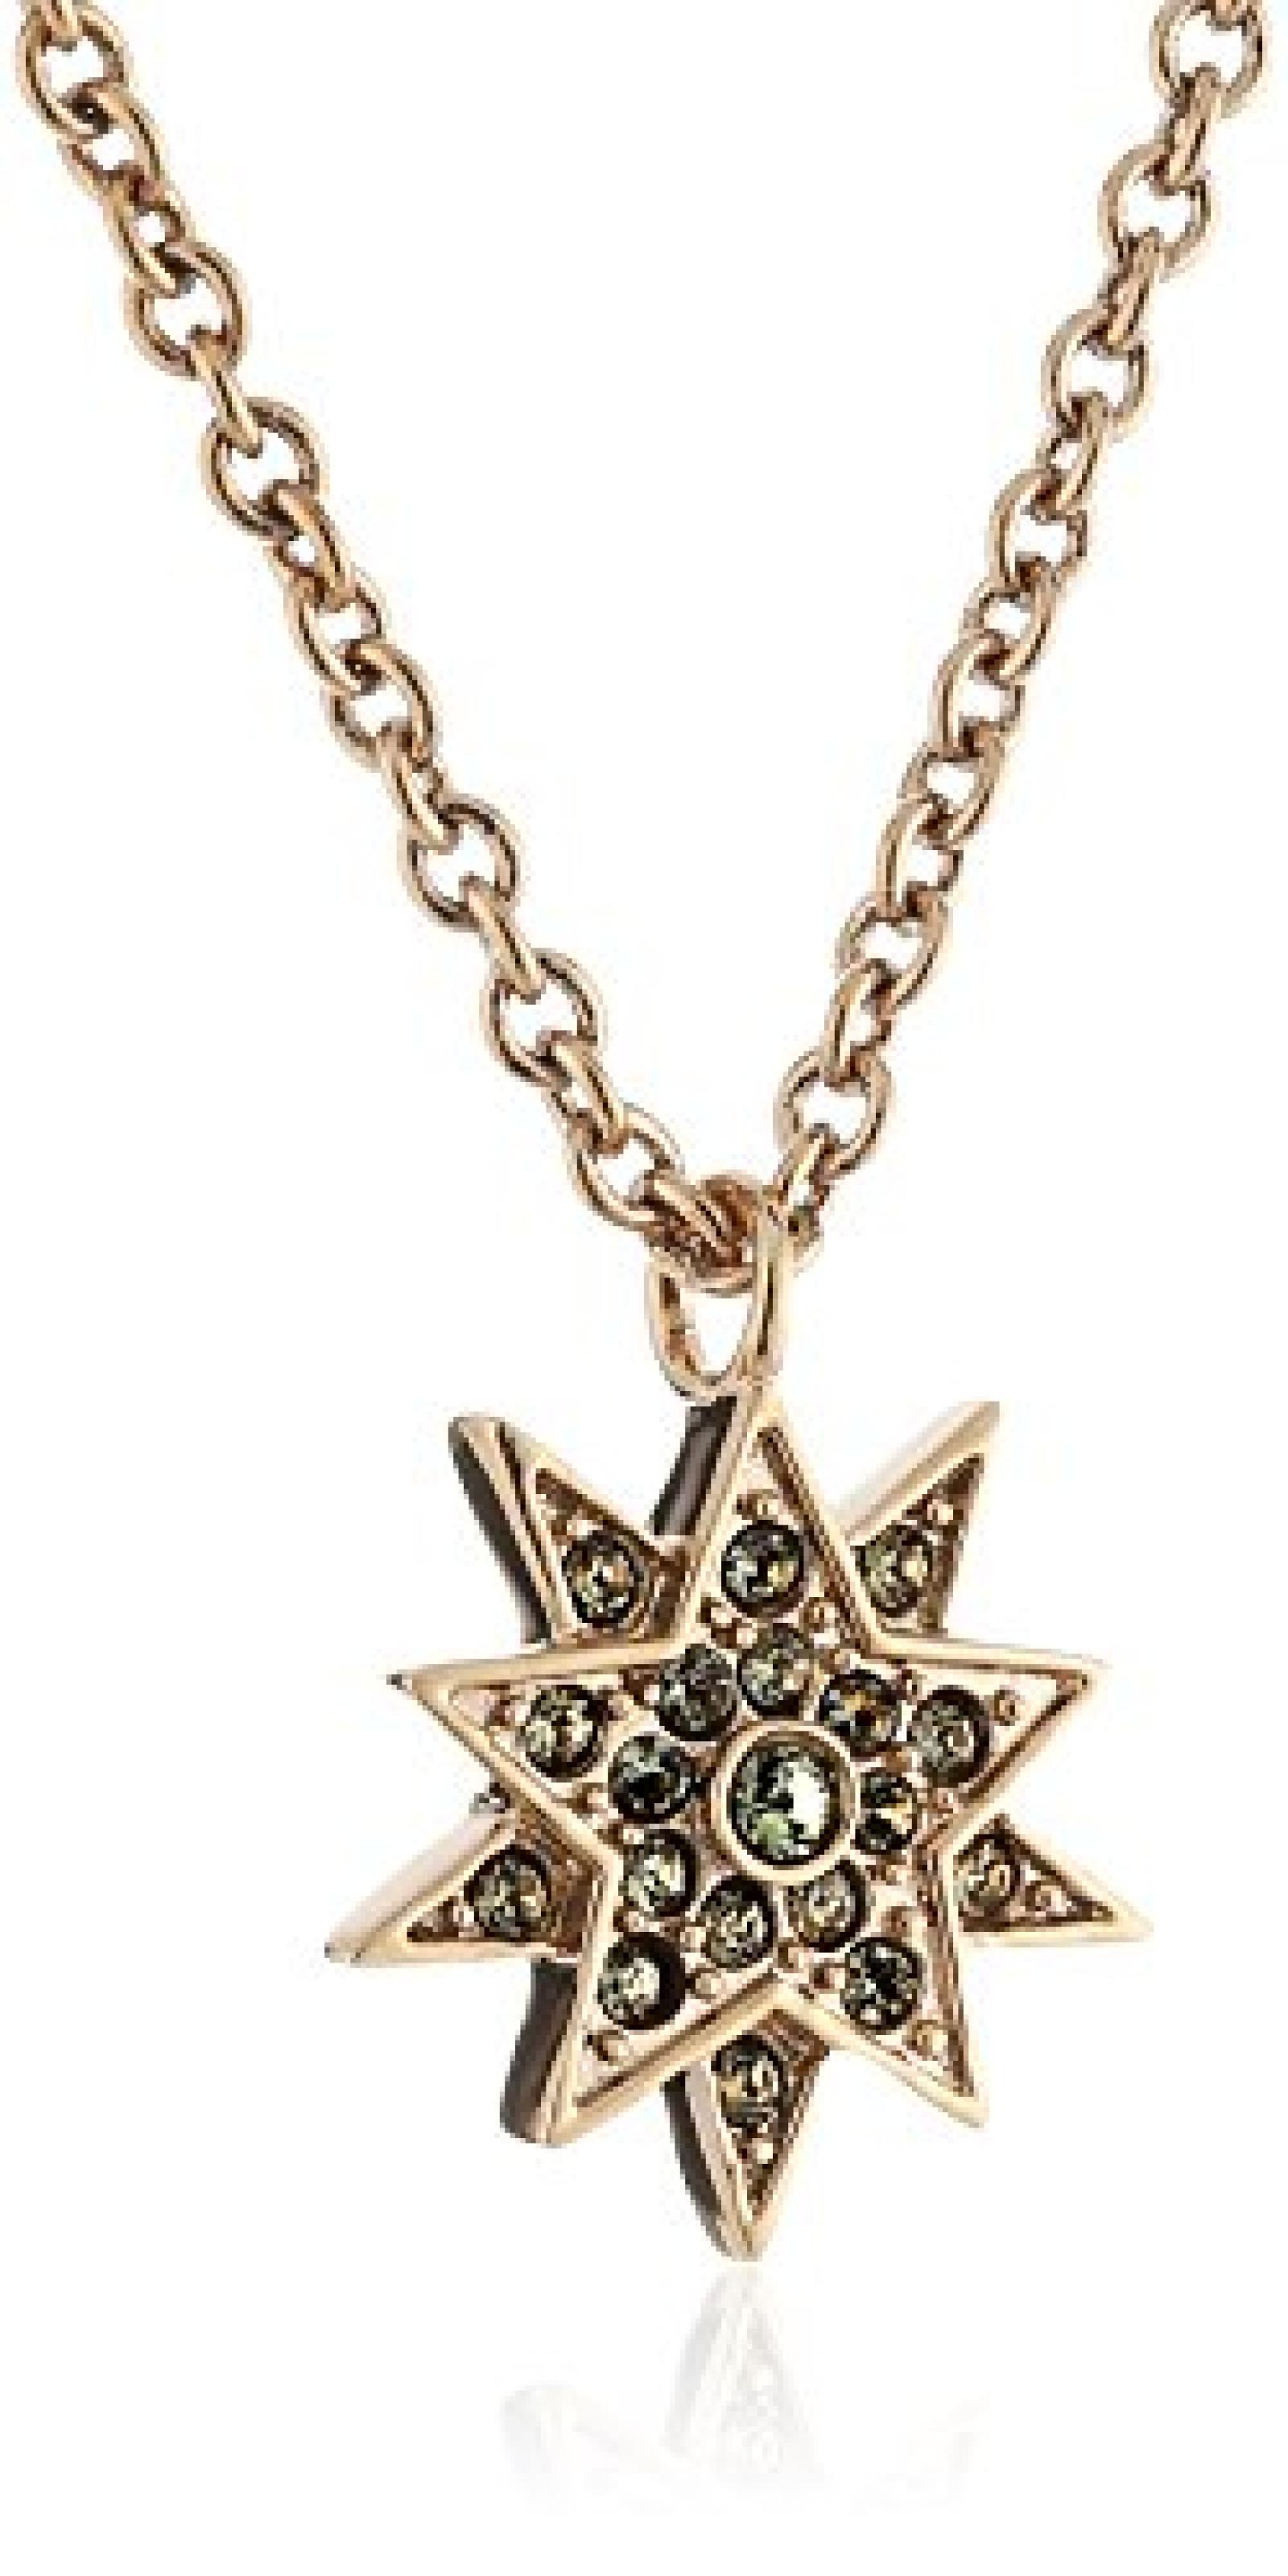 Dyrberg/Kern Damen Halskette Vergoldetes Metall Kristall Swarovski 336173